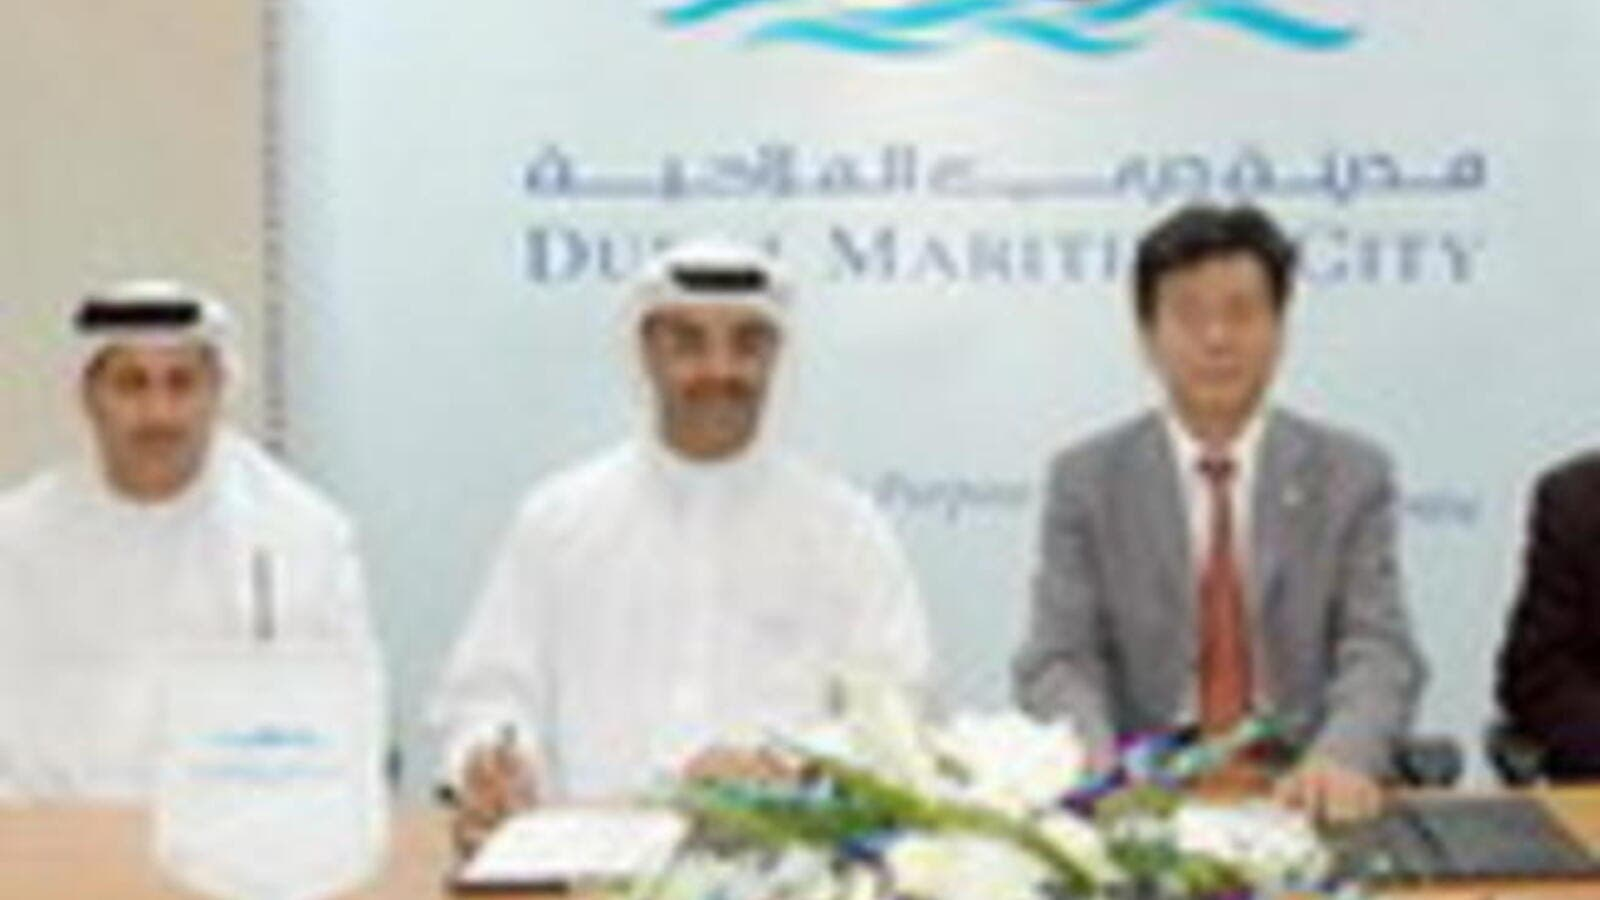 Dubai Maritime City to build Maritime Education University